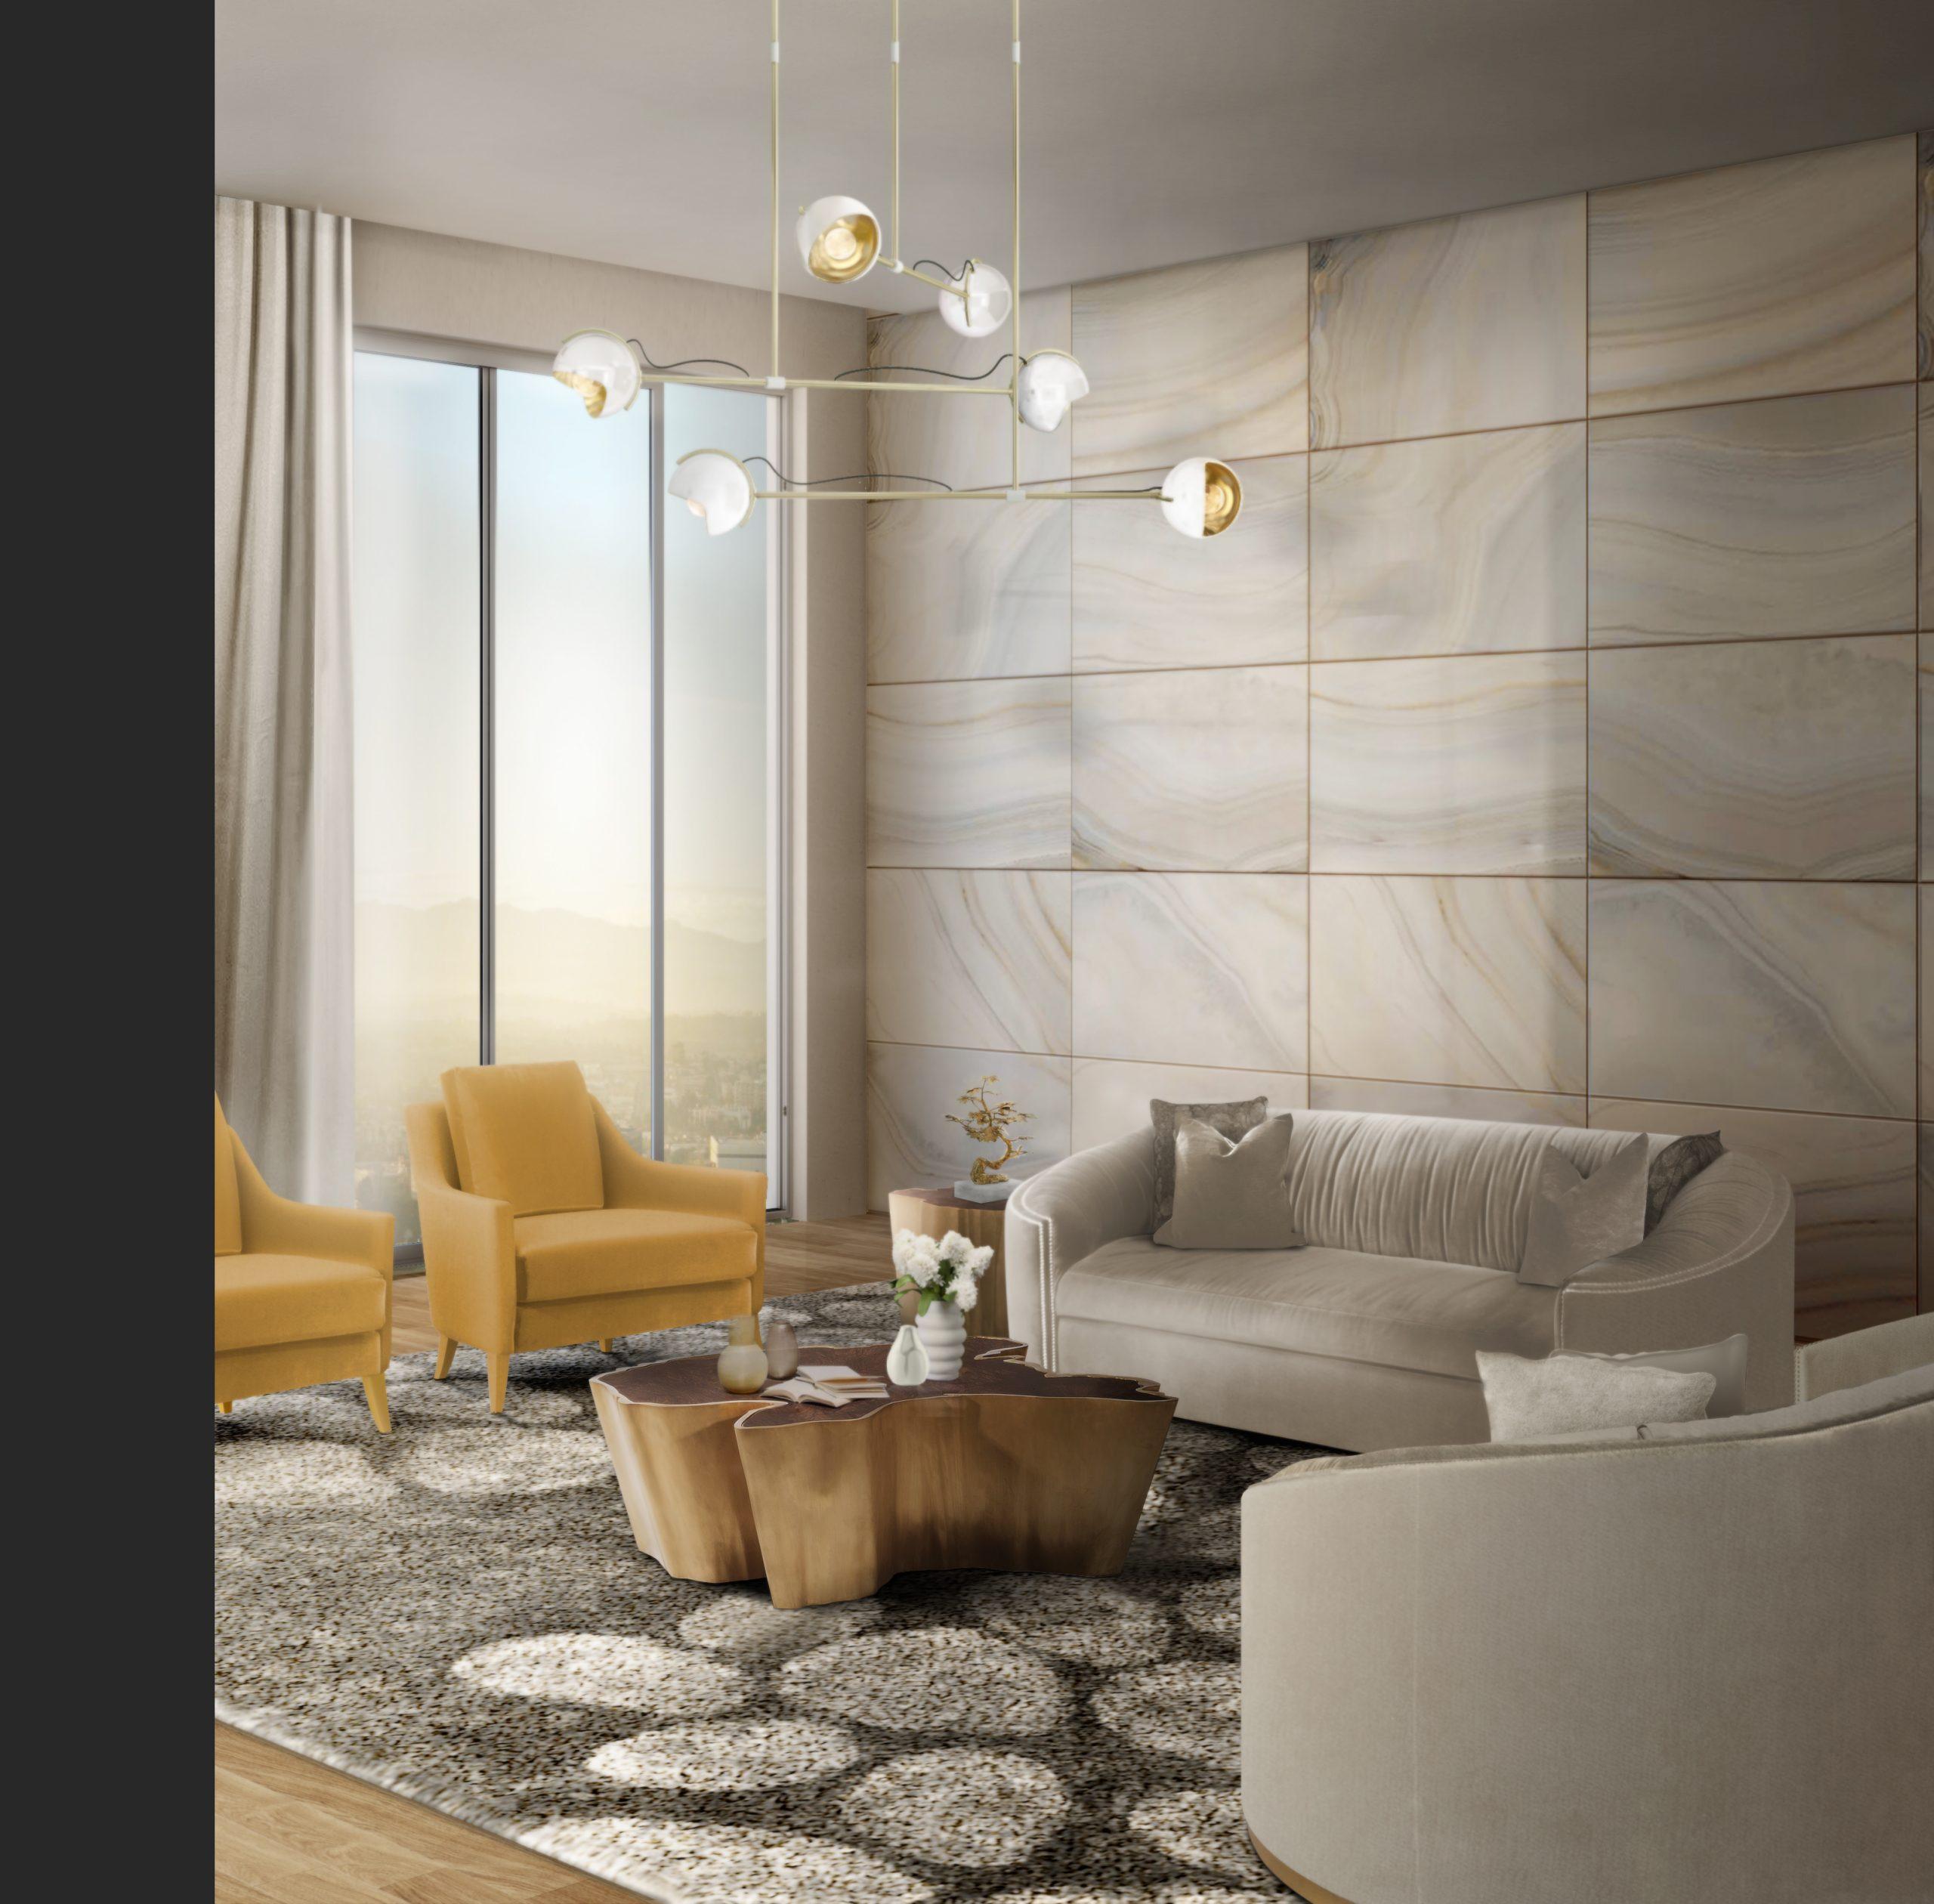 5 Winter Interior Design Trends That Are Far From Boring And Plain! winter interior design 5 Winter Interior Design Trends That Are Far From Boring And Plain! 1 1 scaled